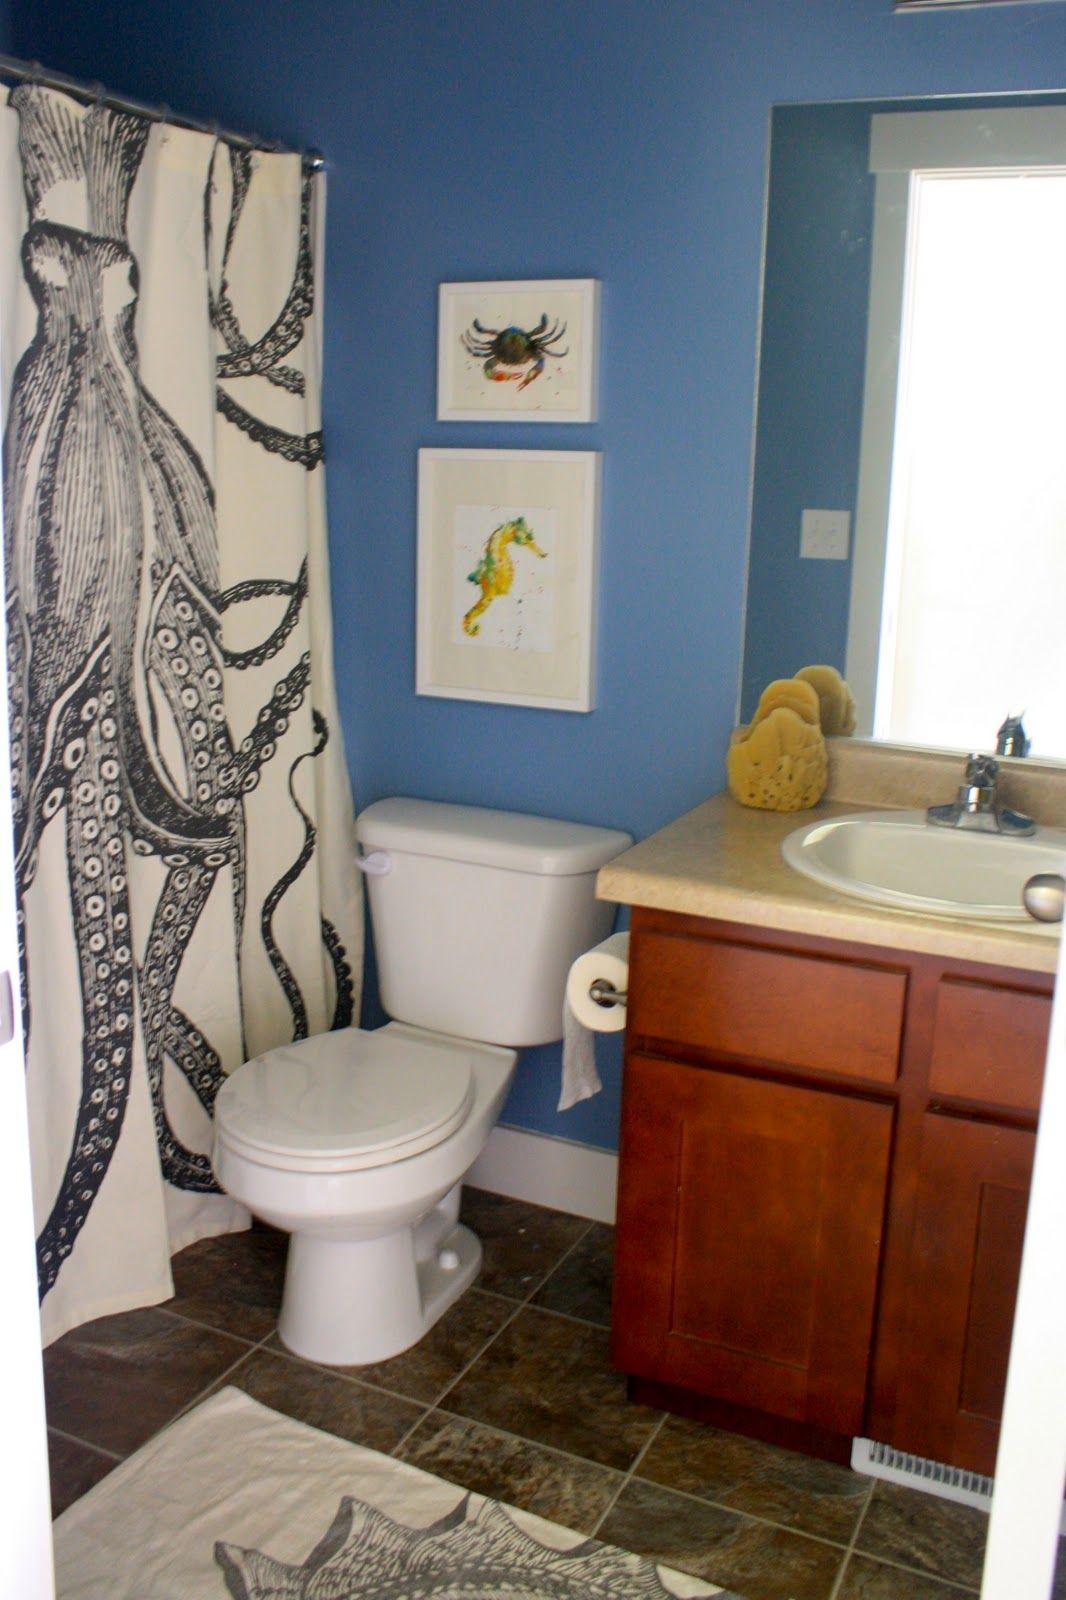 Bathroom colors themes decor ideas on pinterest shower - Powder Room